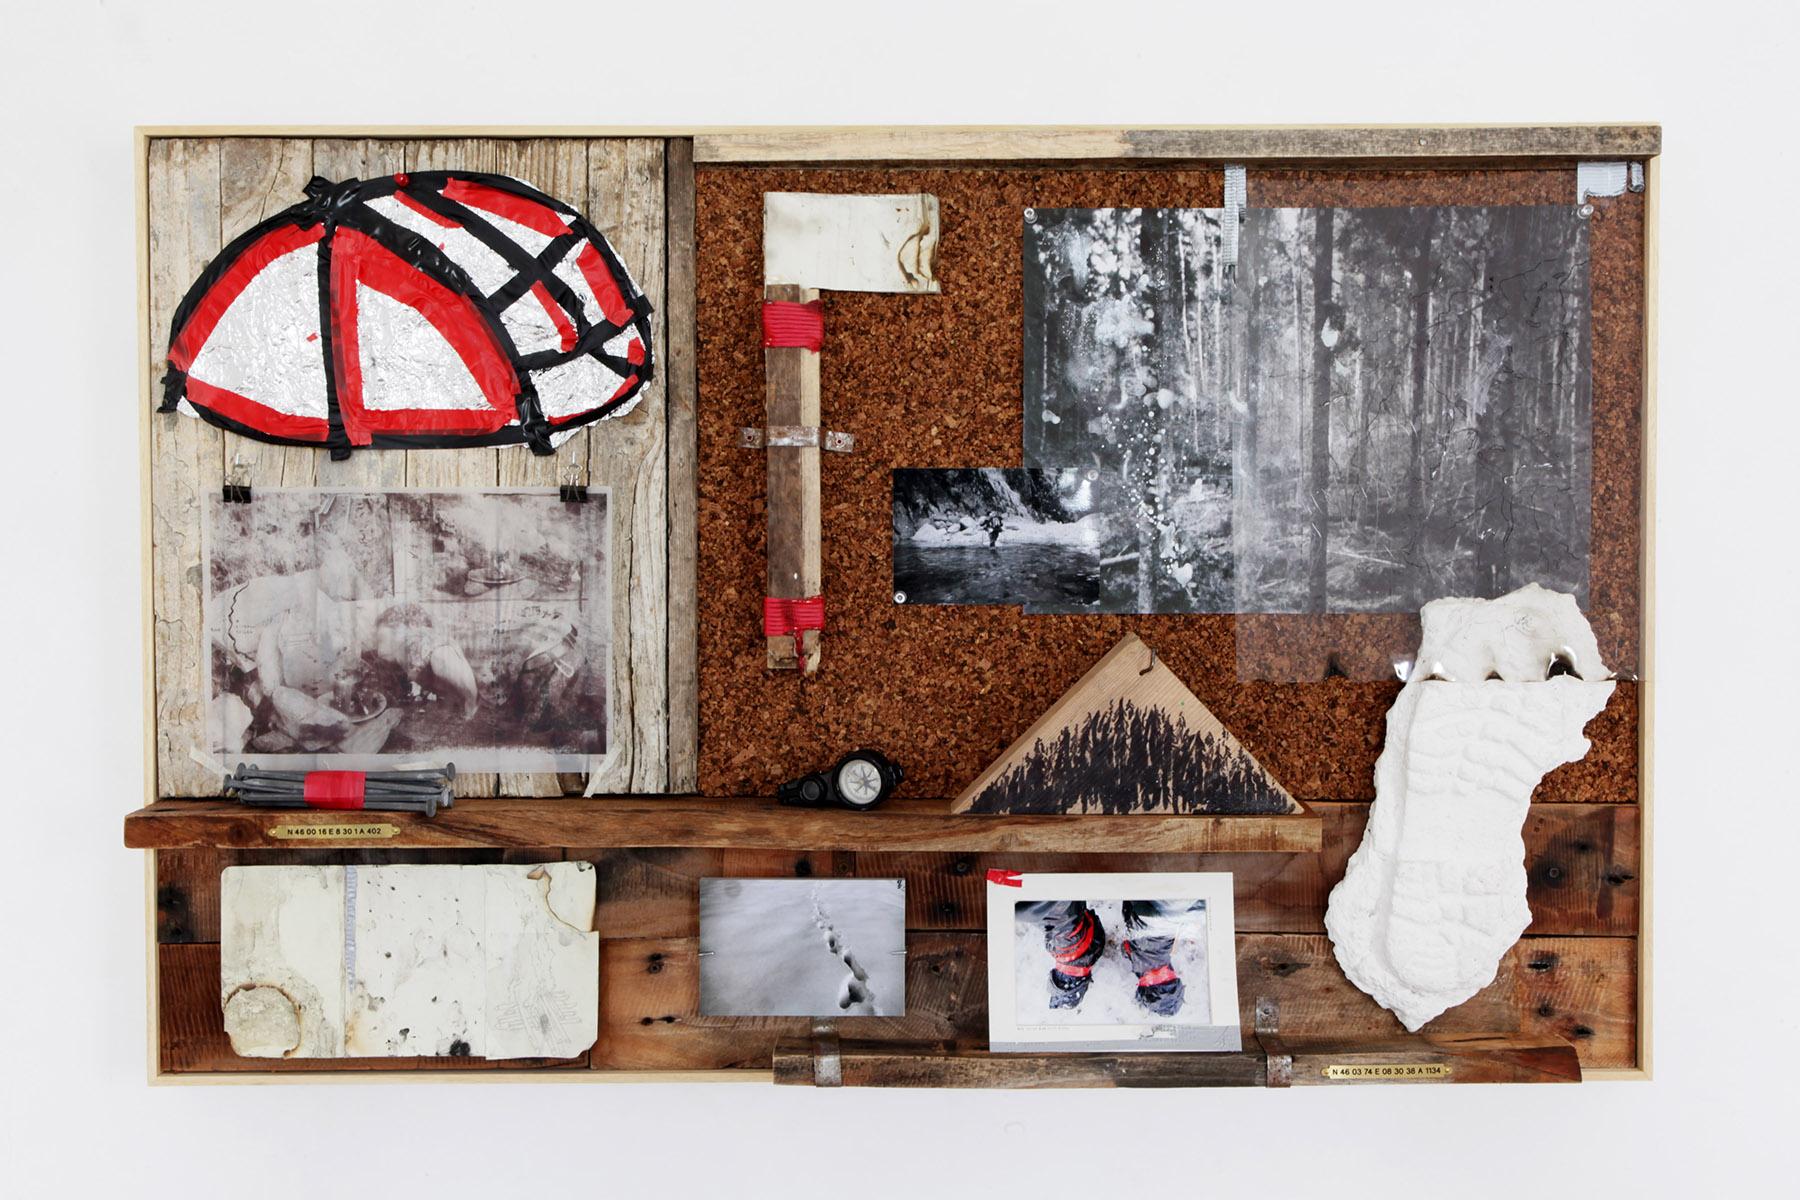 Daniele Girardi, 2021, Residuo Arcaico 1, opera arte, artwork, artista